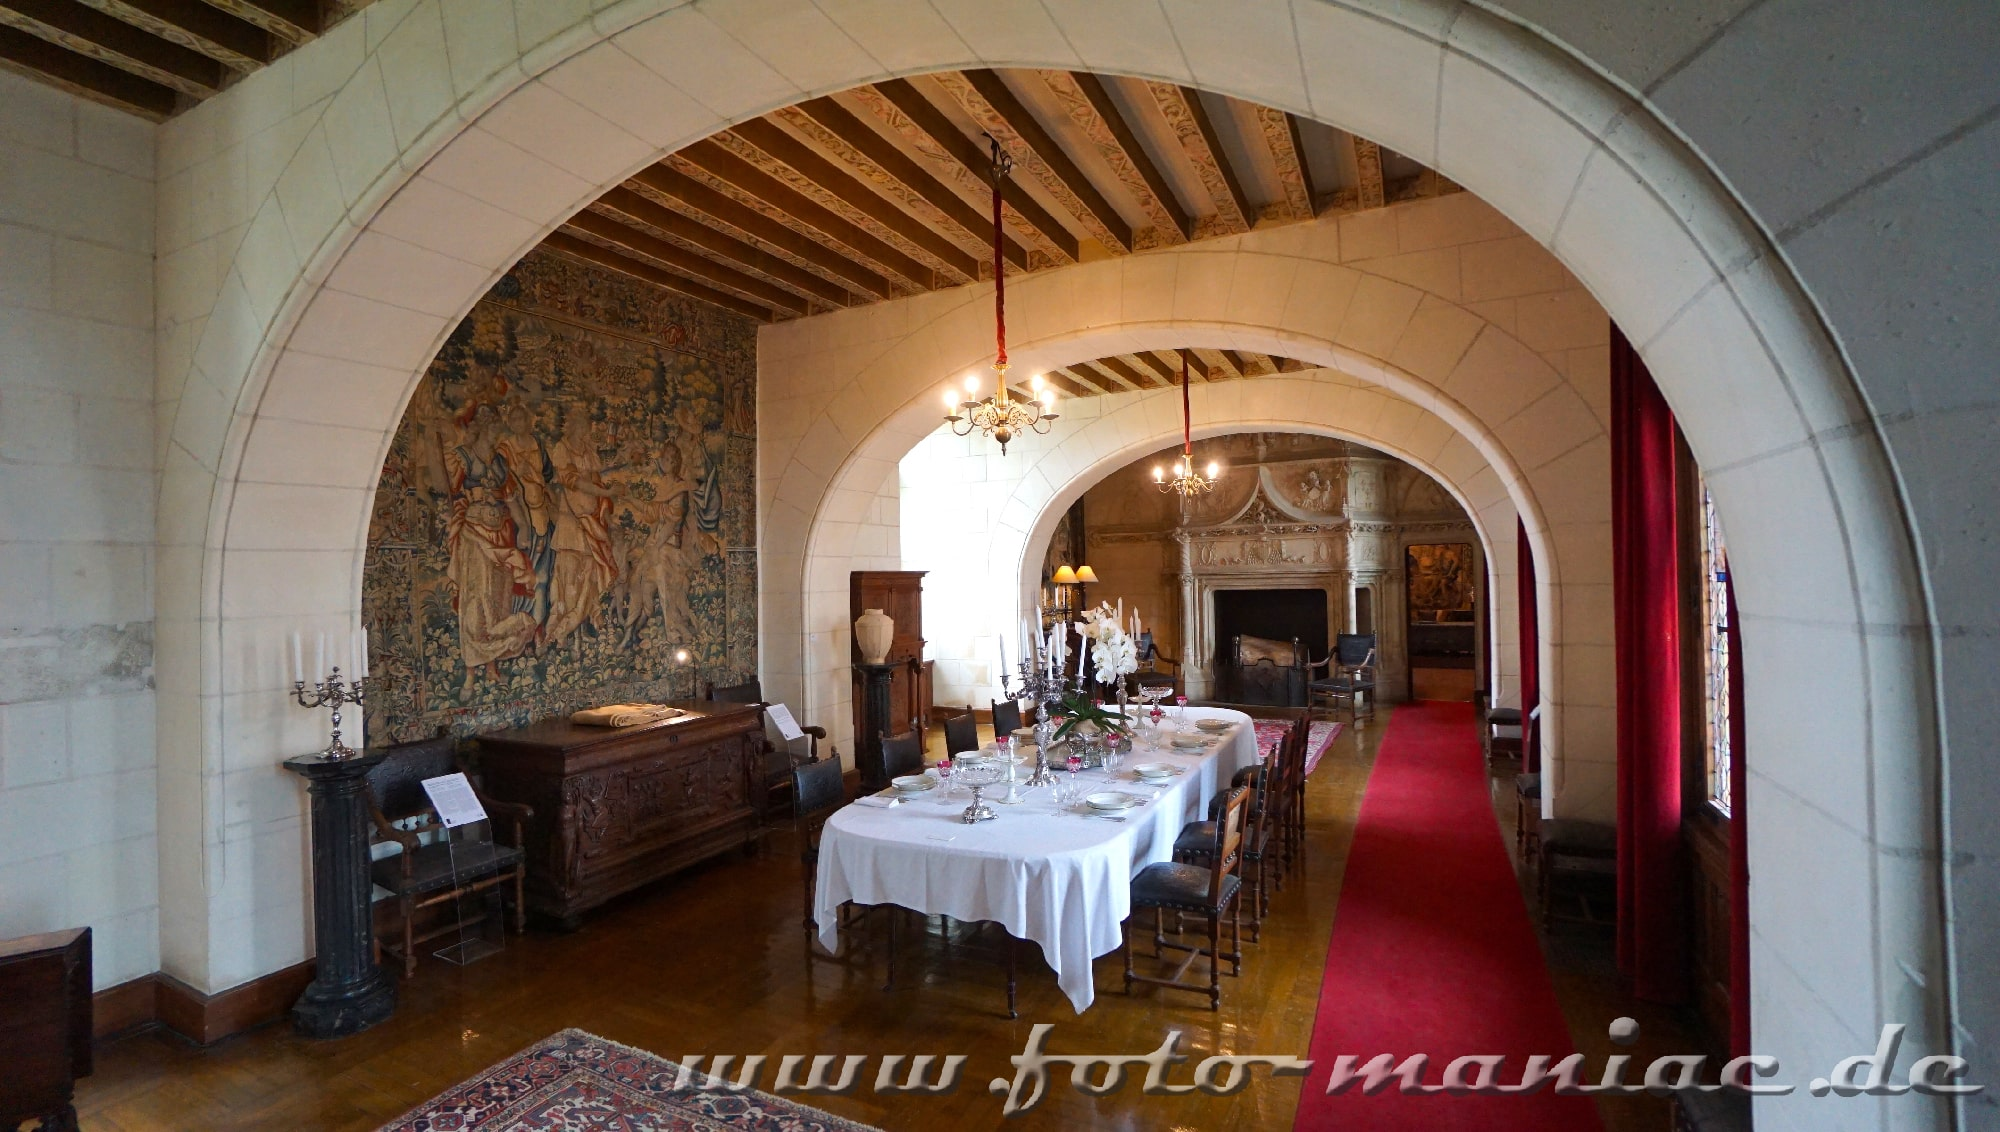 Speisezimmer Chateau Chaumont